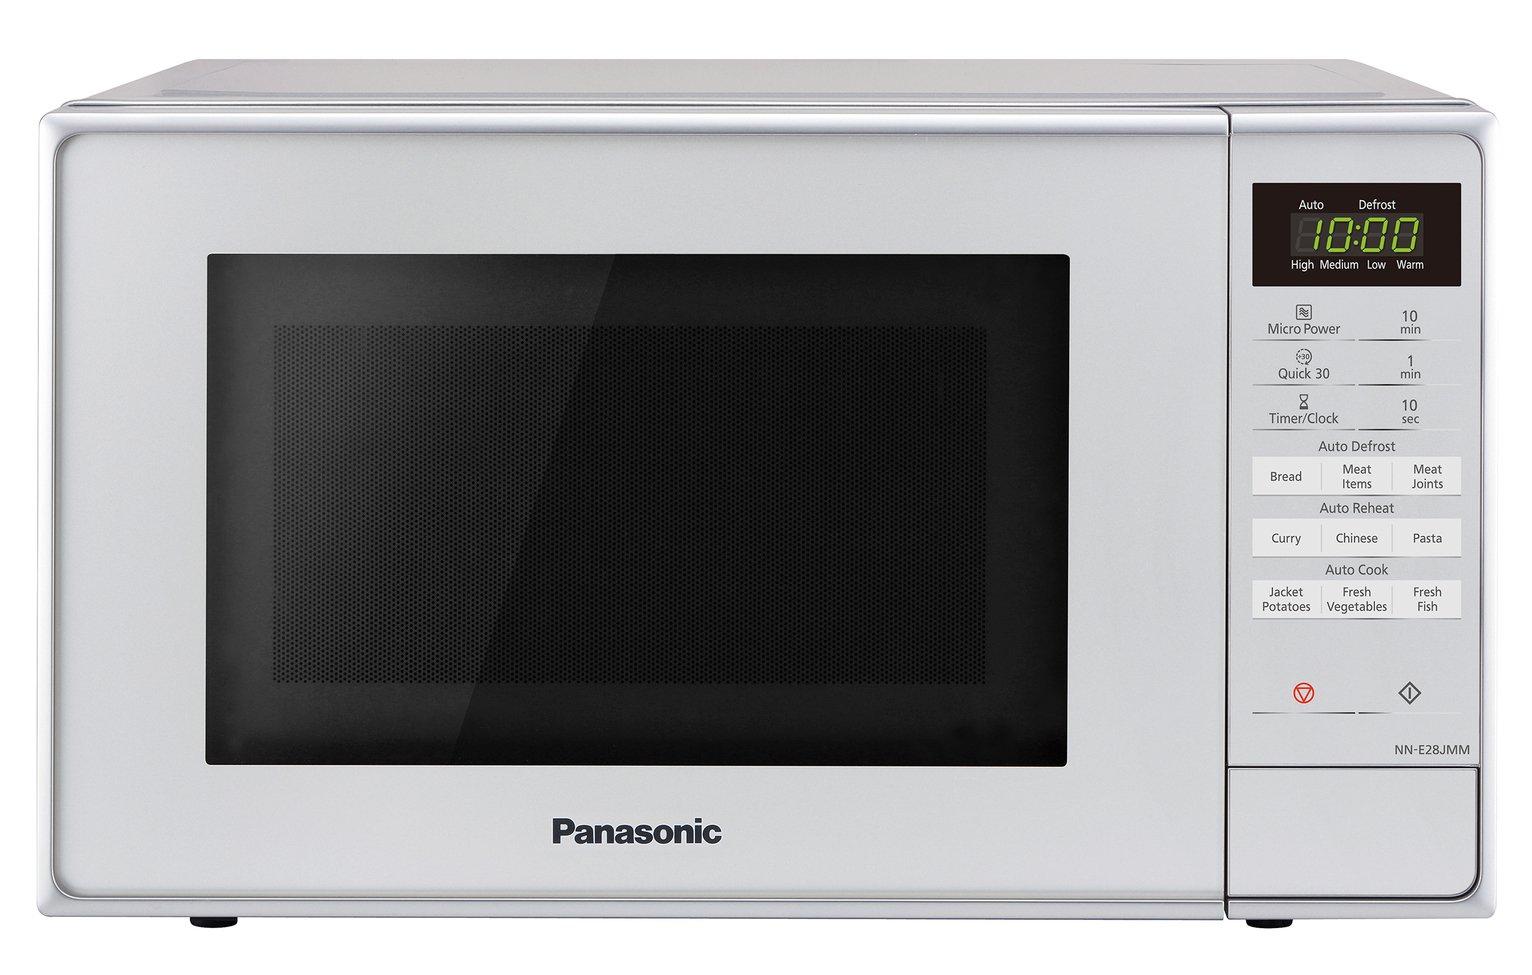 buy panasonic 800w standard 20l microwave nn e28jmmbpq silver microwaves argos